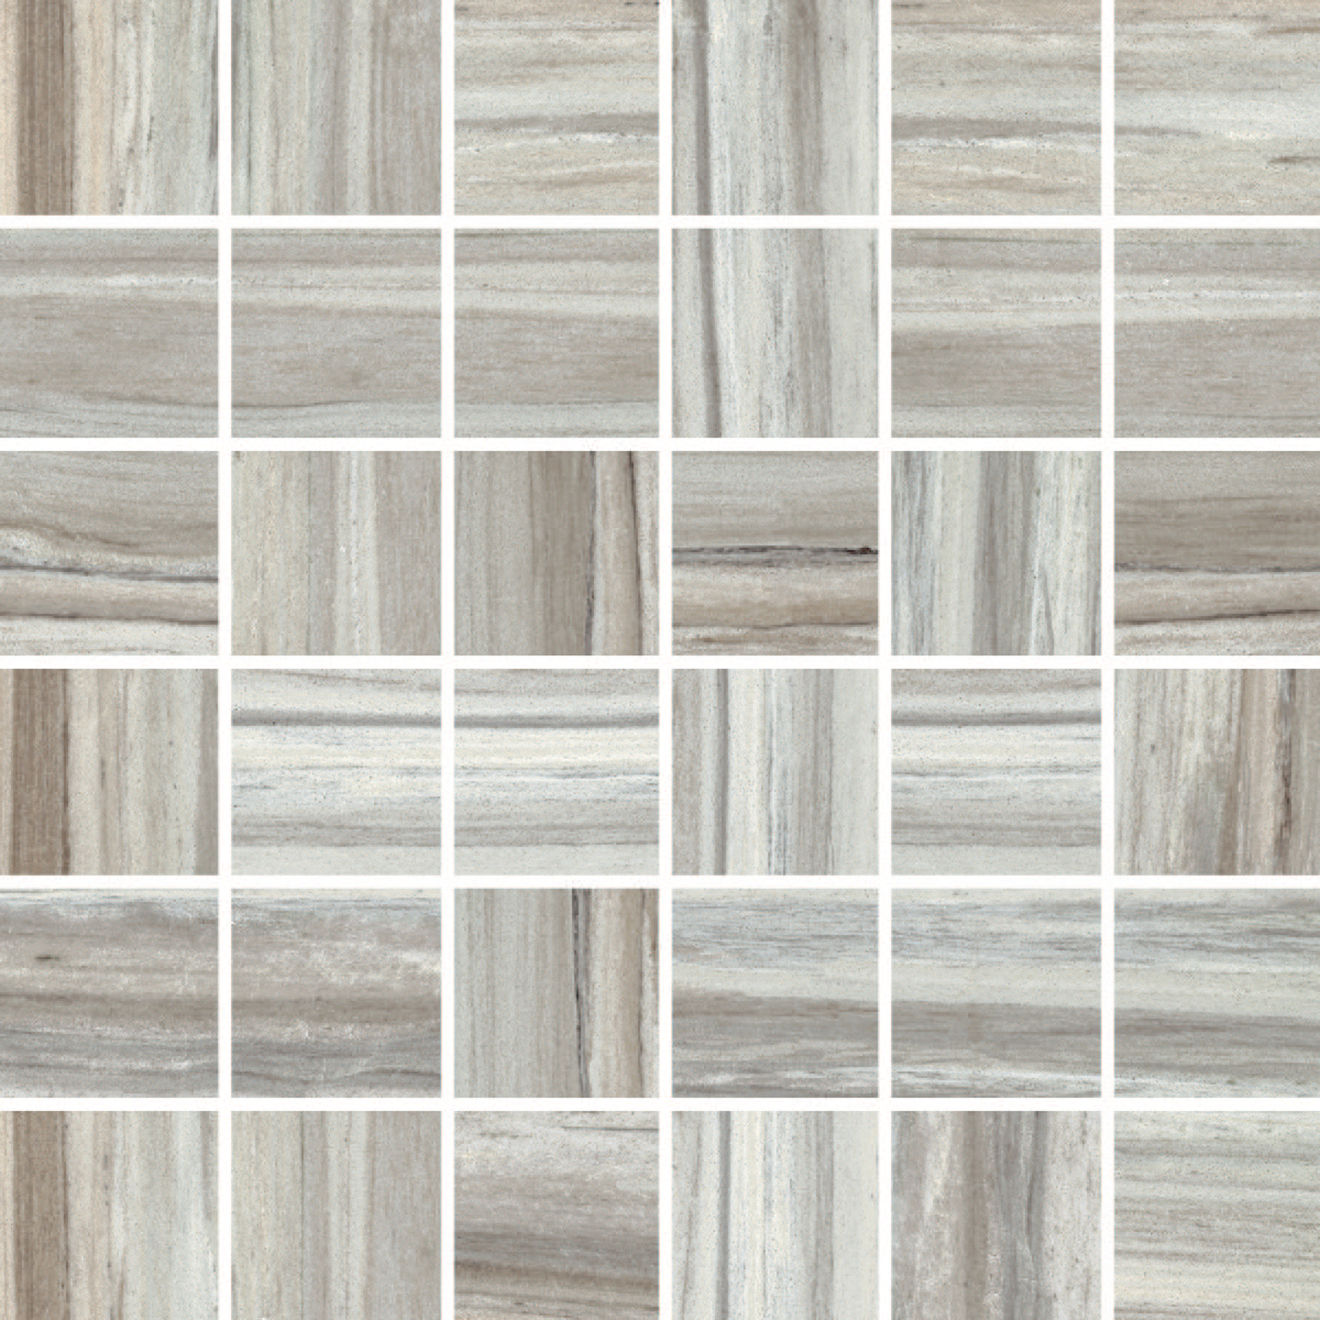 "Zebrino 2"" x 2"" Floor & Wall Mosaic in Bluette"